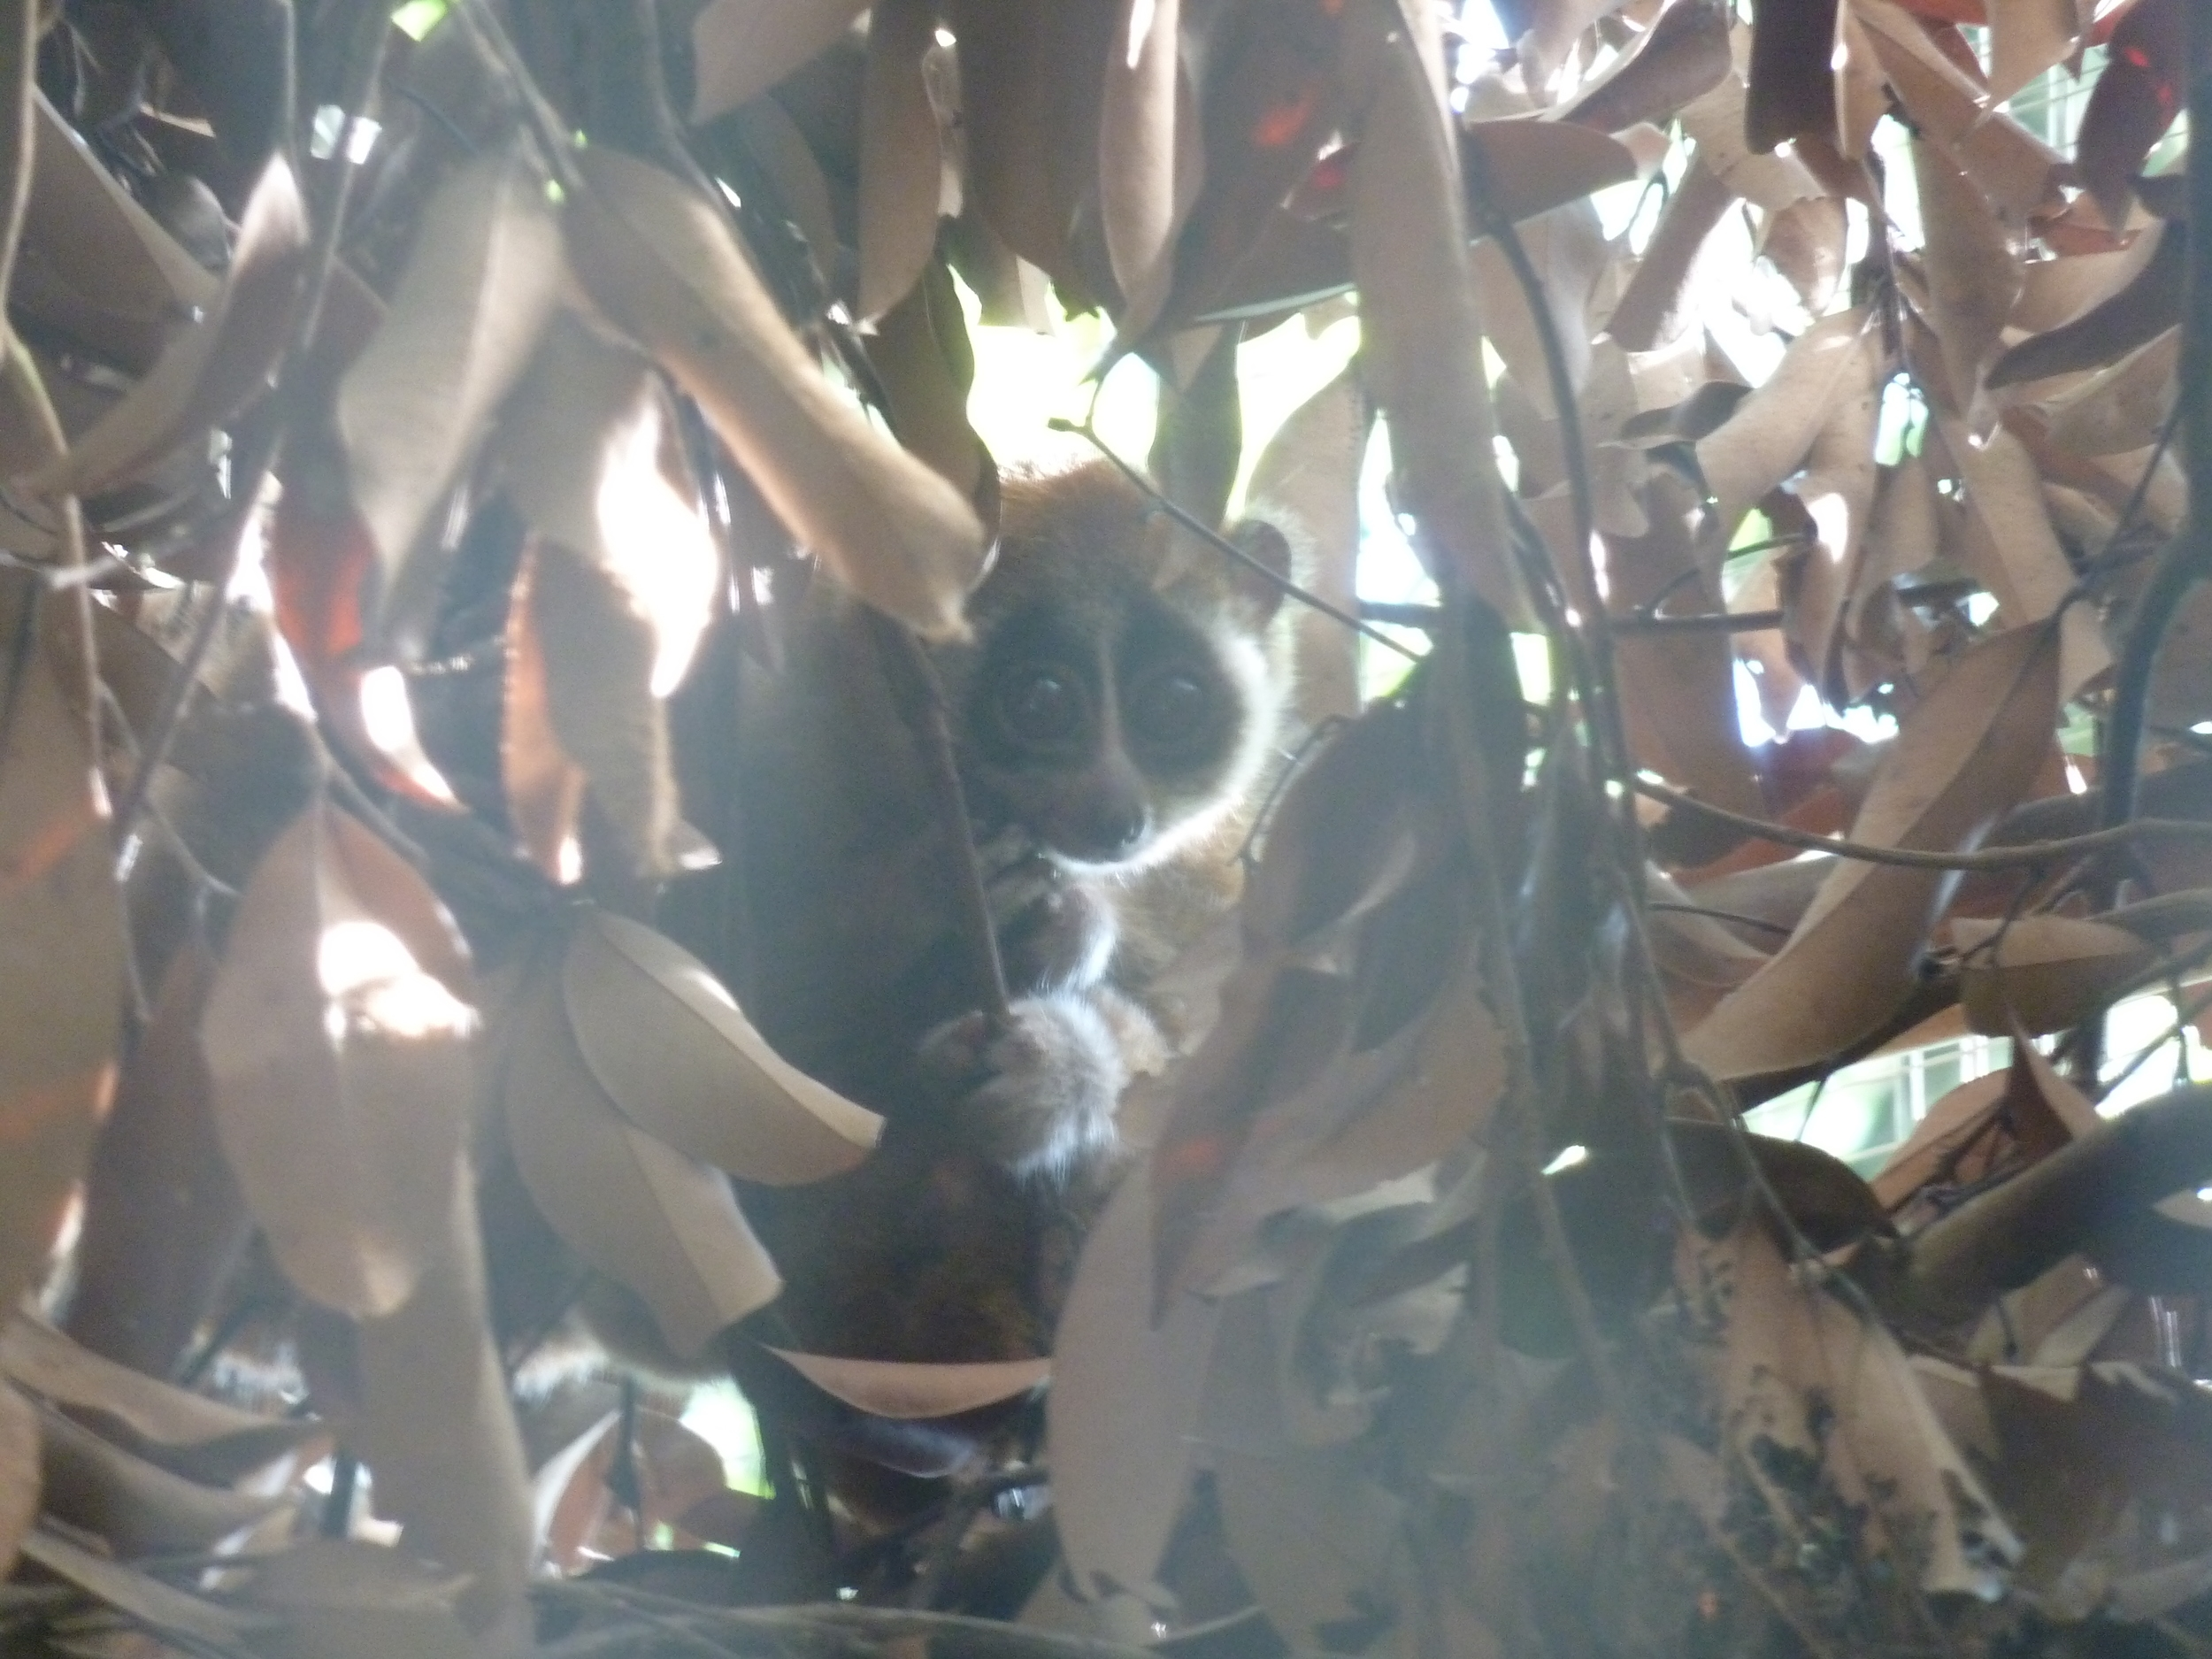 Slow loris at the Cuc Phuong Endangered Primate Rescue Center, Vietnam.